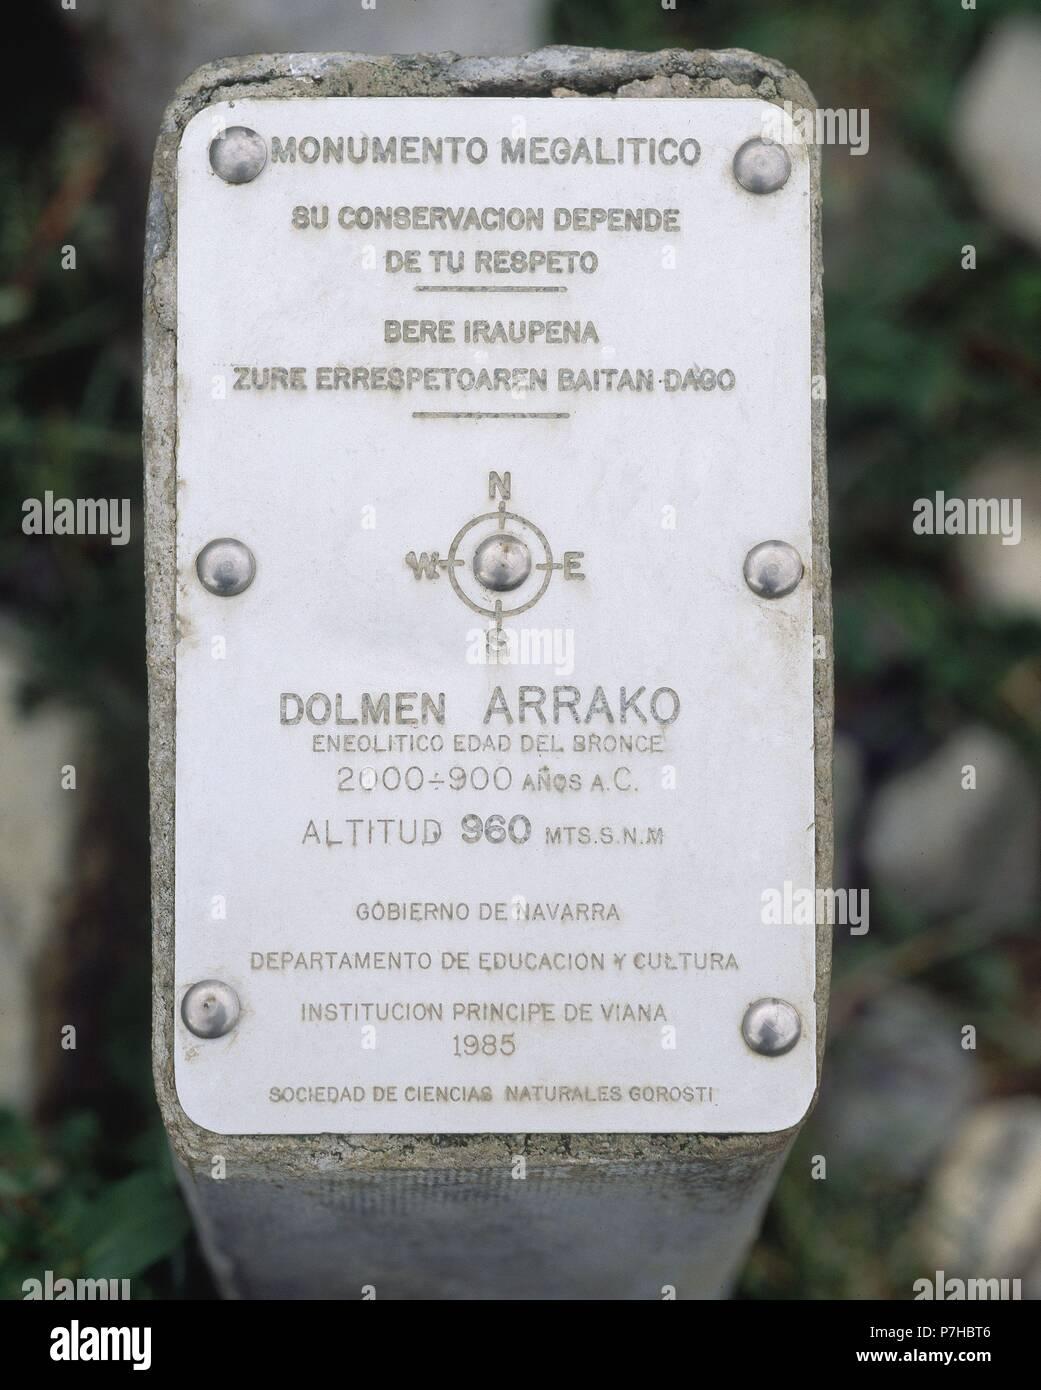 CARTEL DEL MONUMENTO MEGALITICO DE ARRAKO. Location: EXTERIOR, RONCAL, NAVARRA, SPAIN. - Stock Image